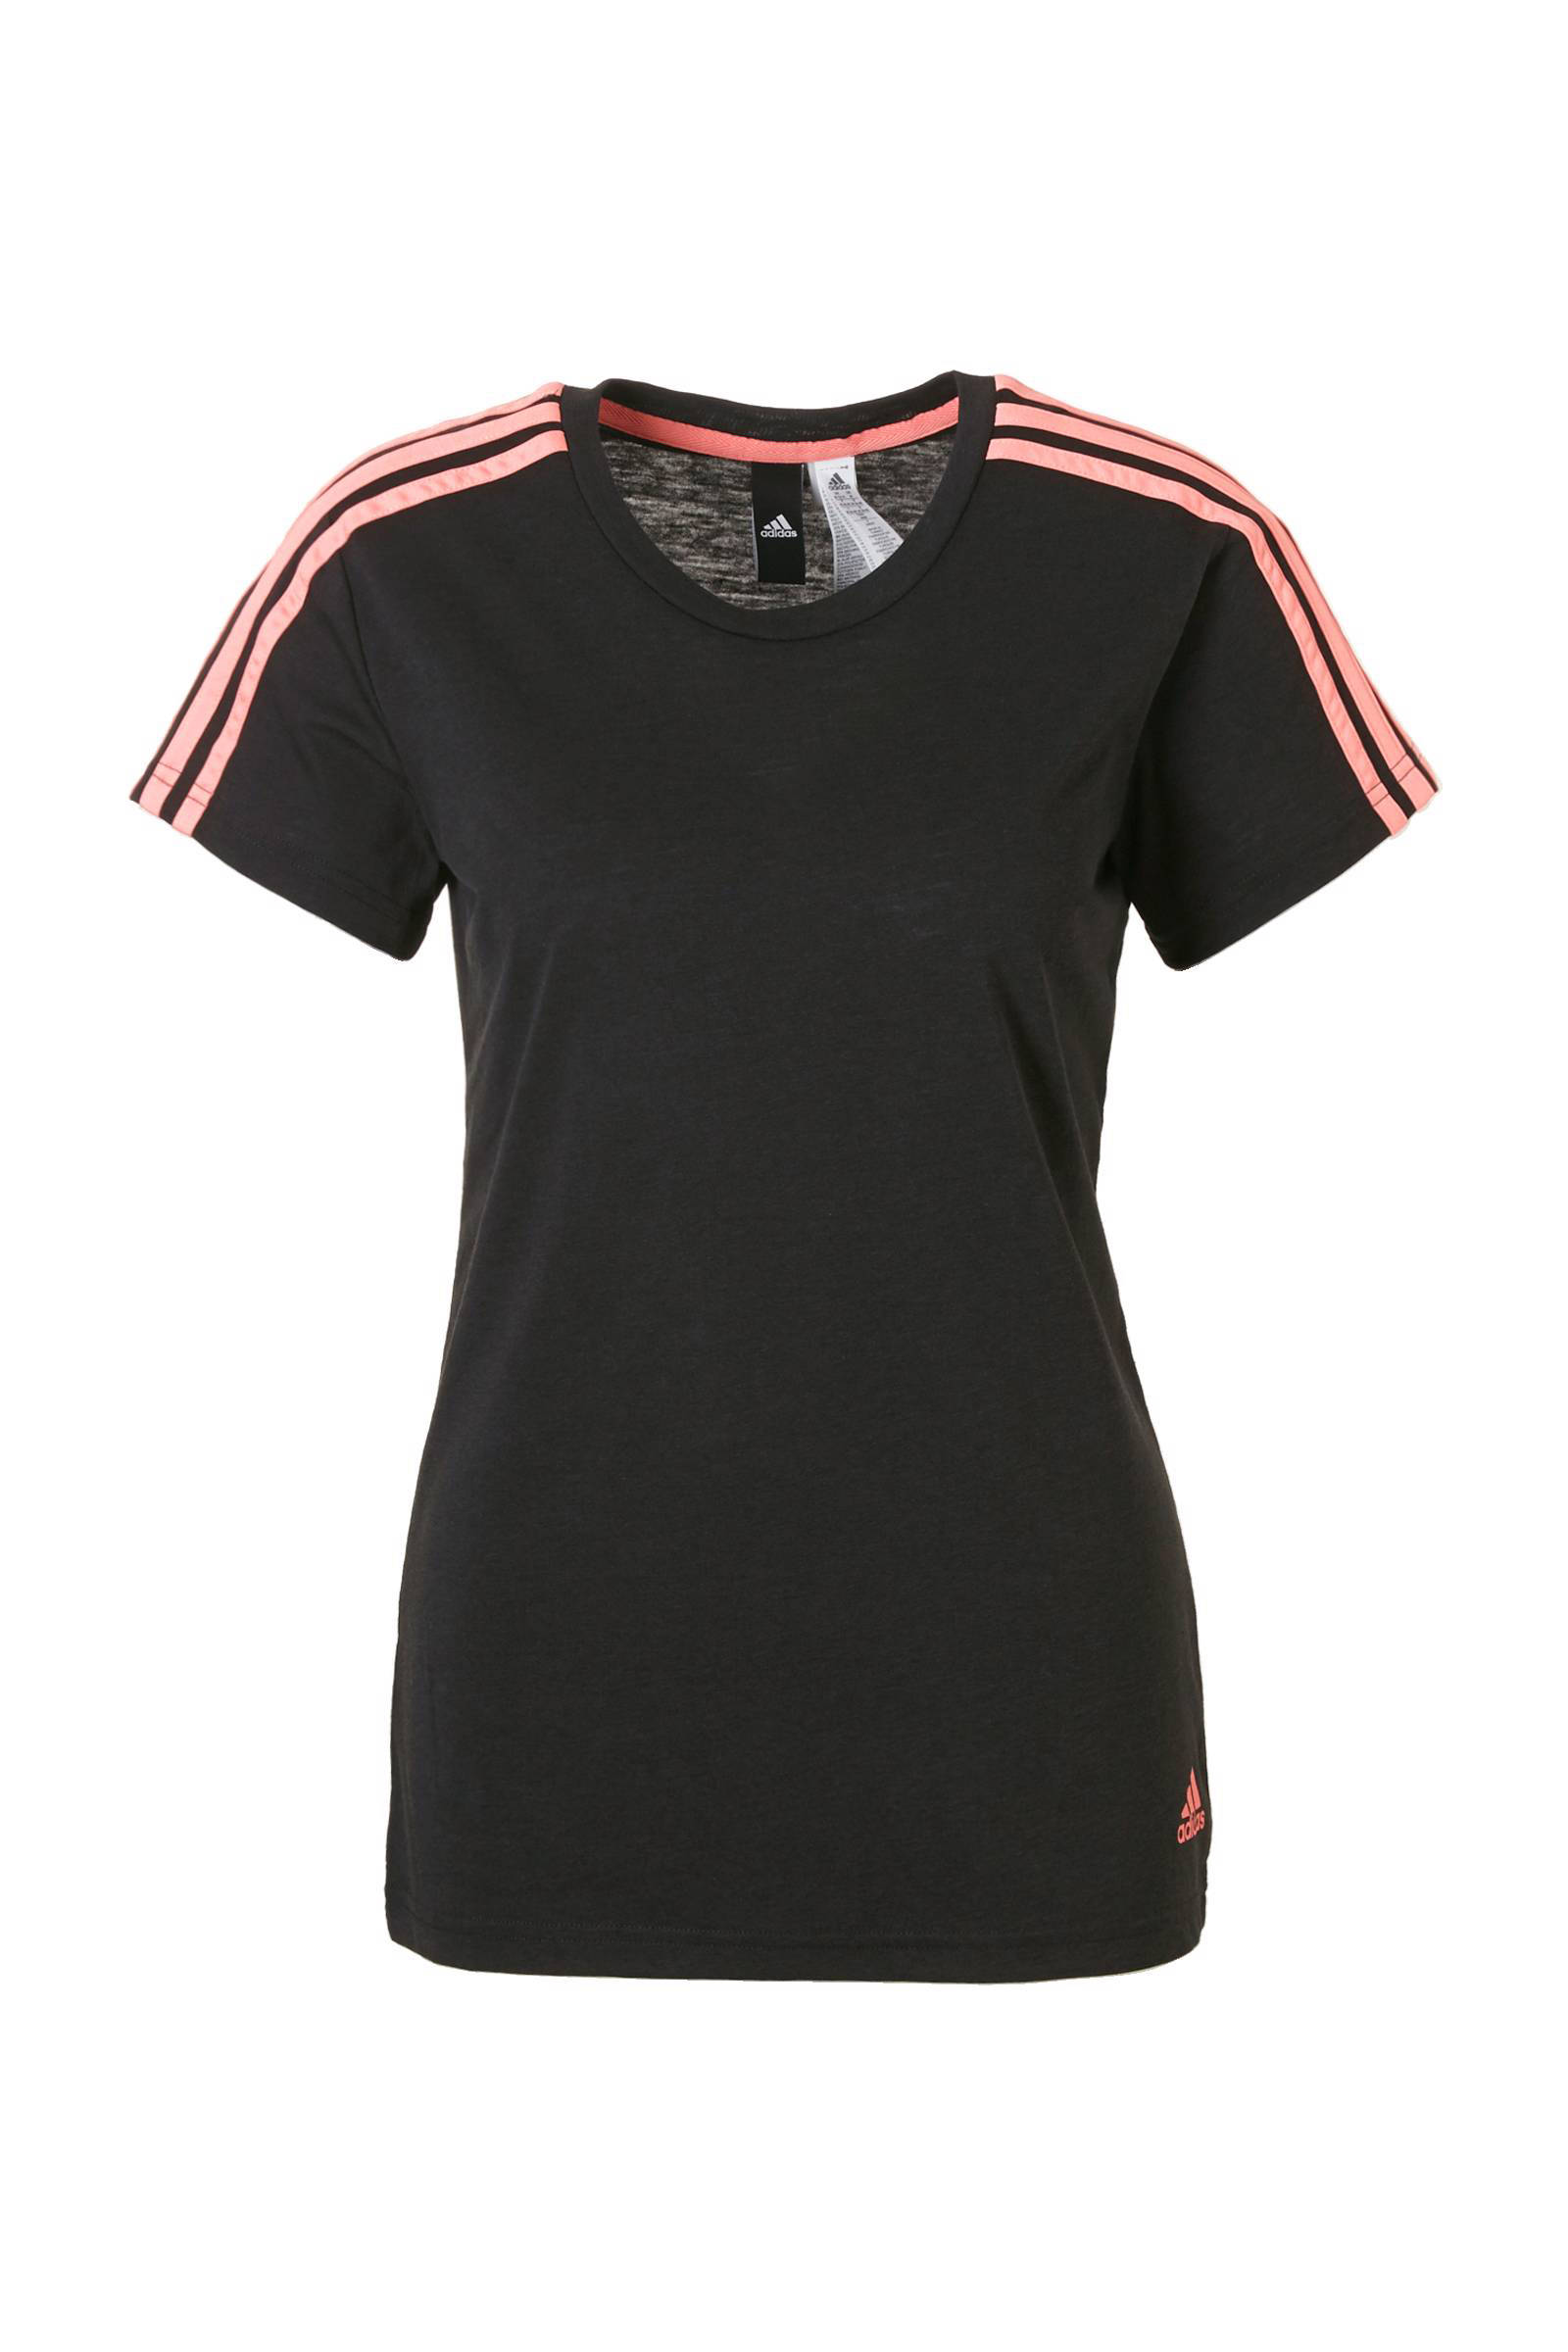 adidas performance adidas Performance sport T-shirt | wehkamp